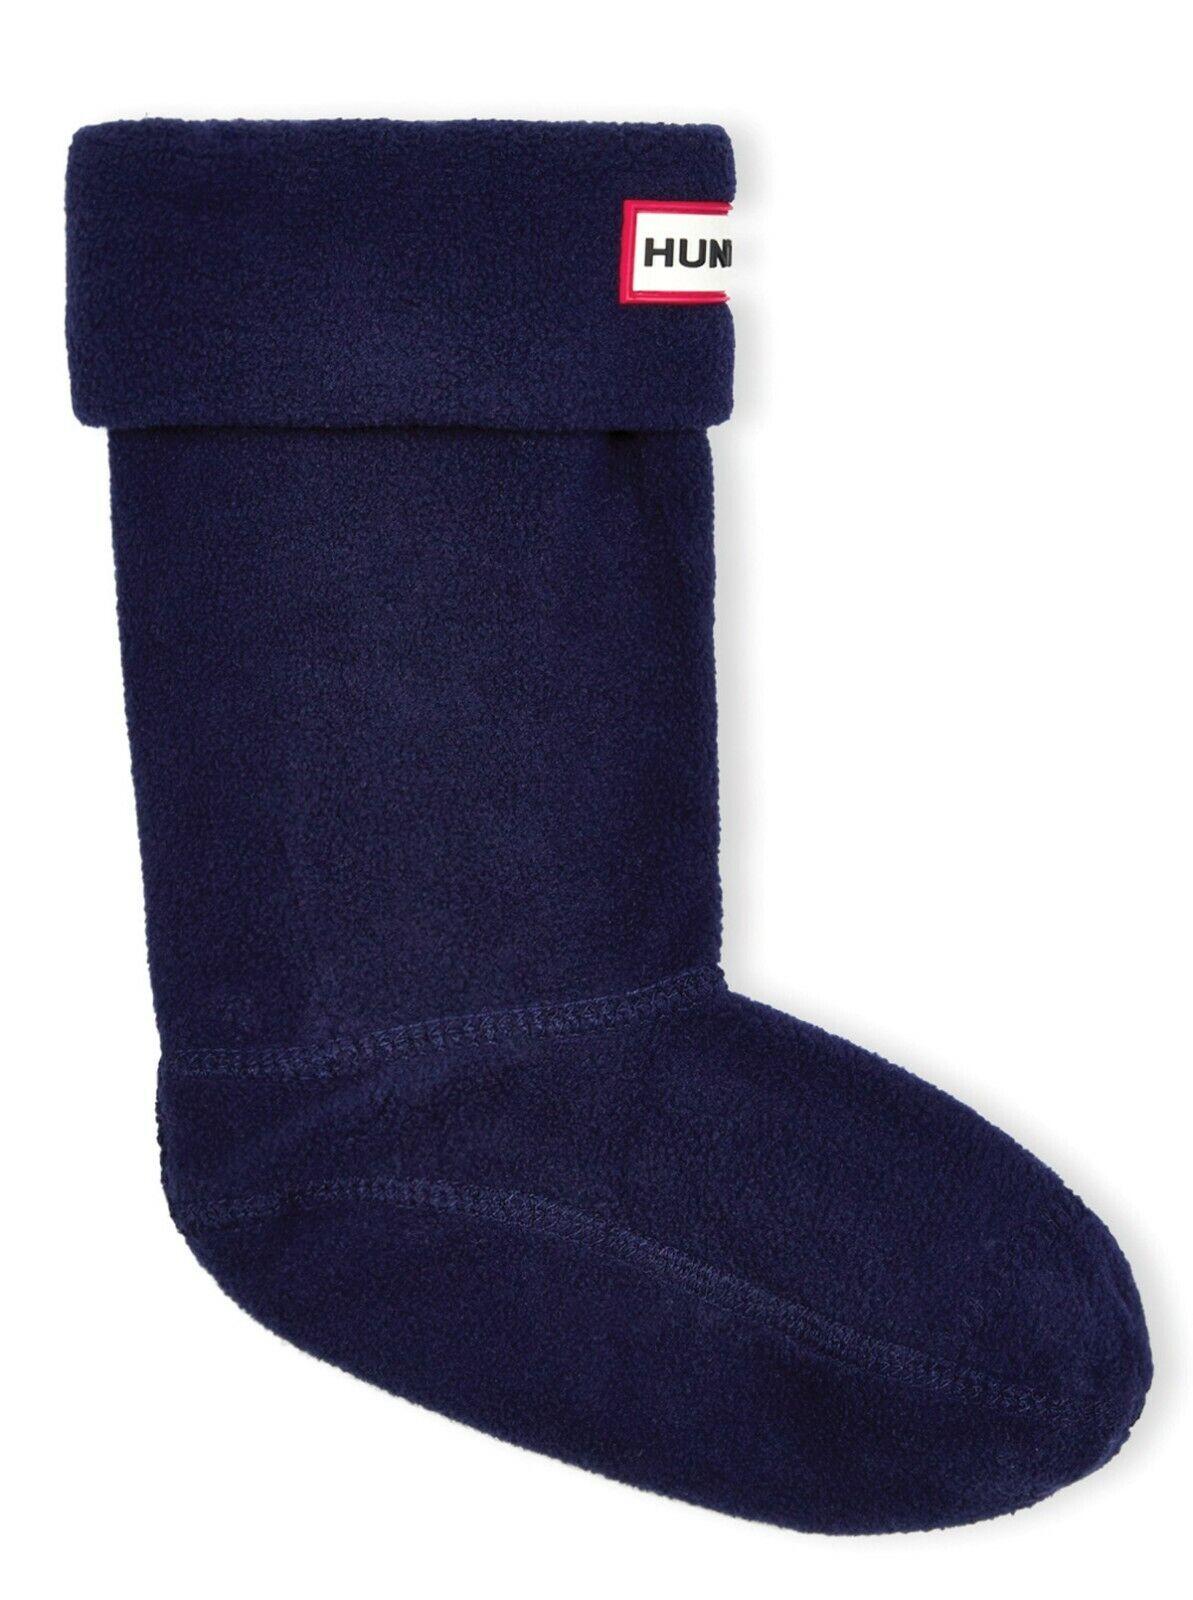 Red New In Box Hunter Kids Original Boot Socks eu24-27 Size Uk7-9